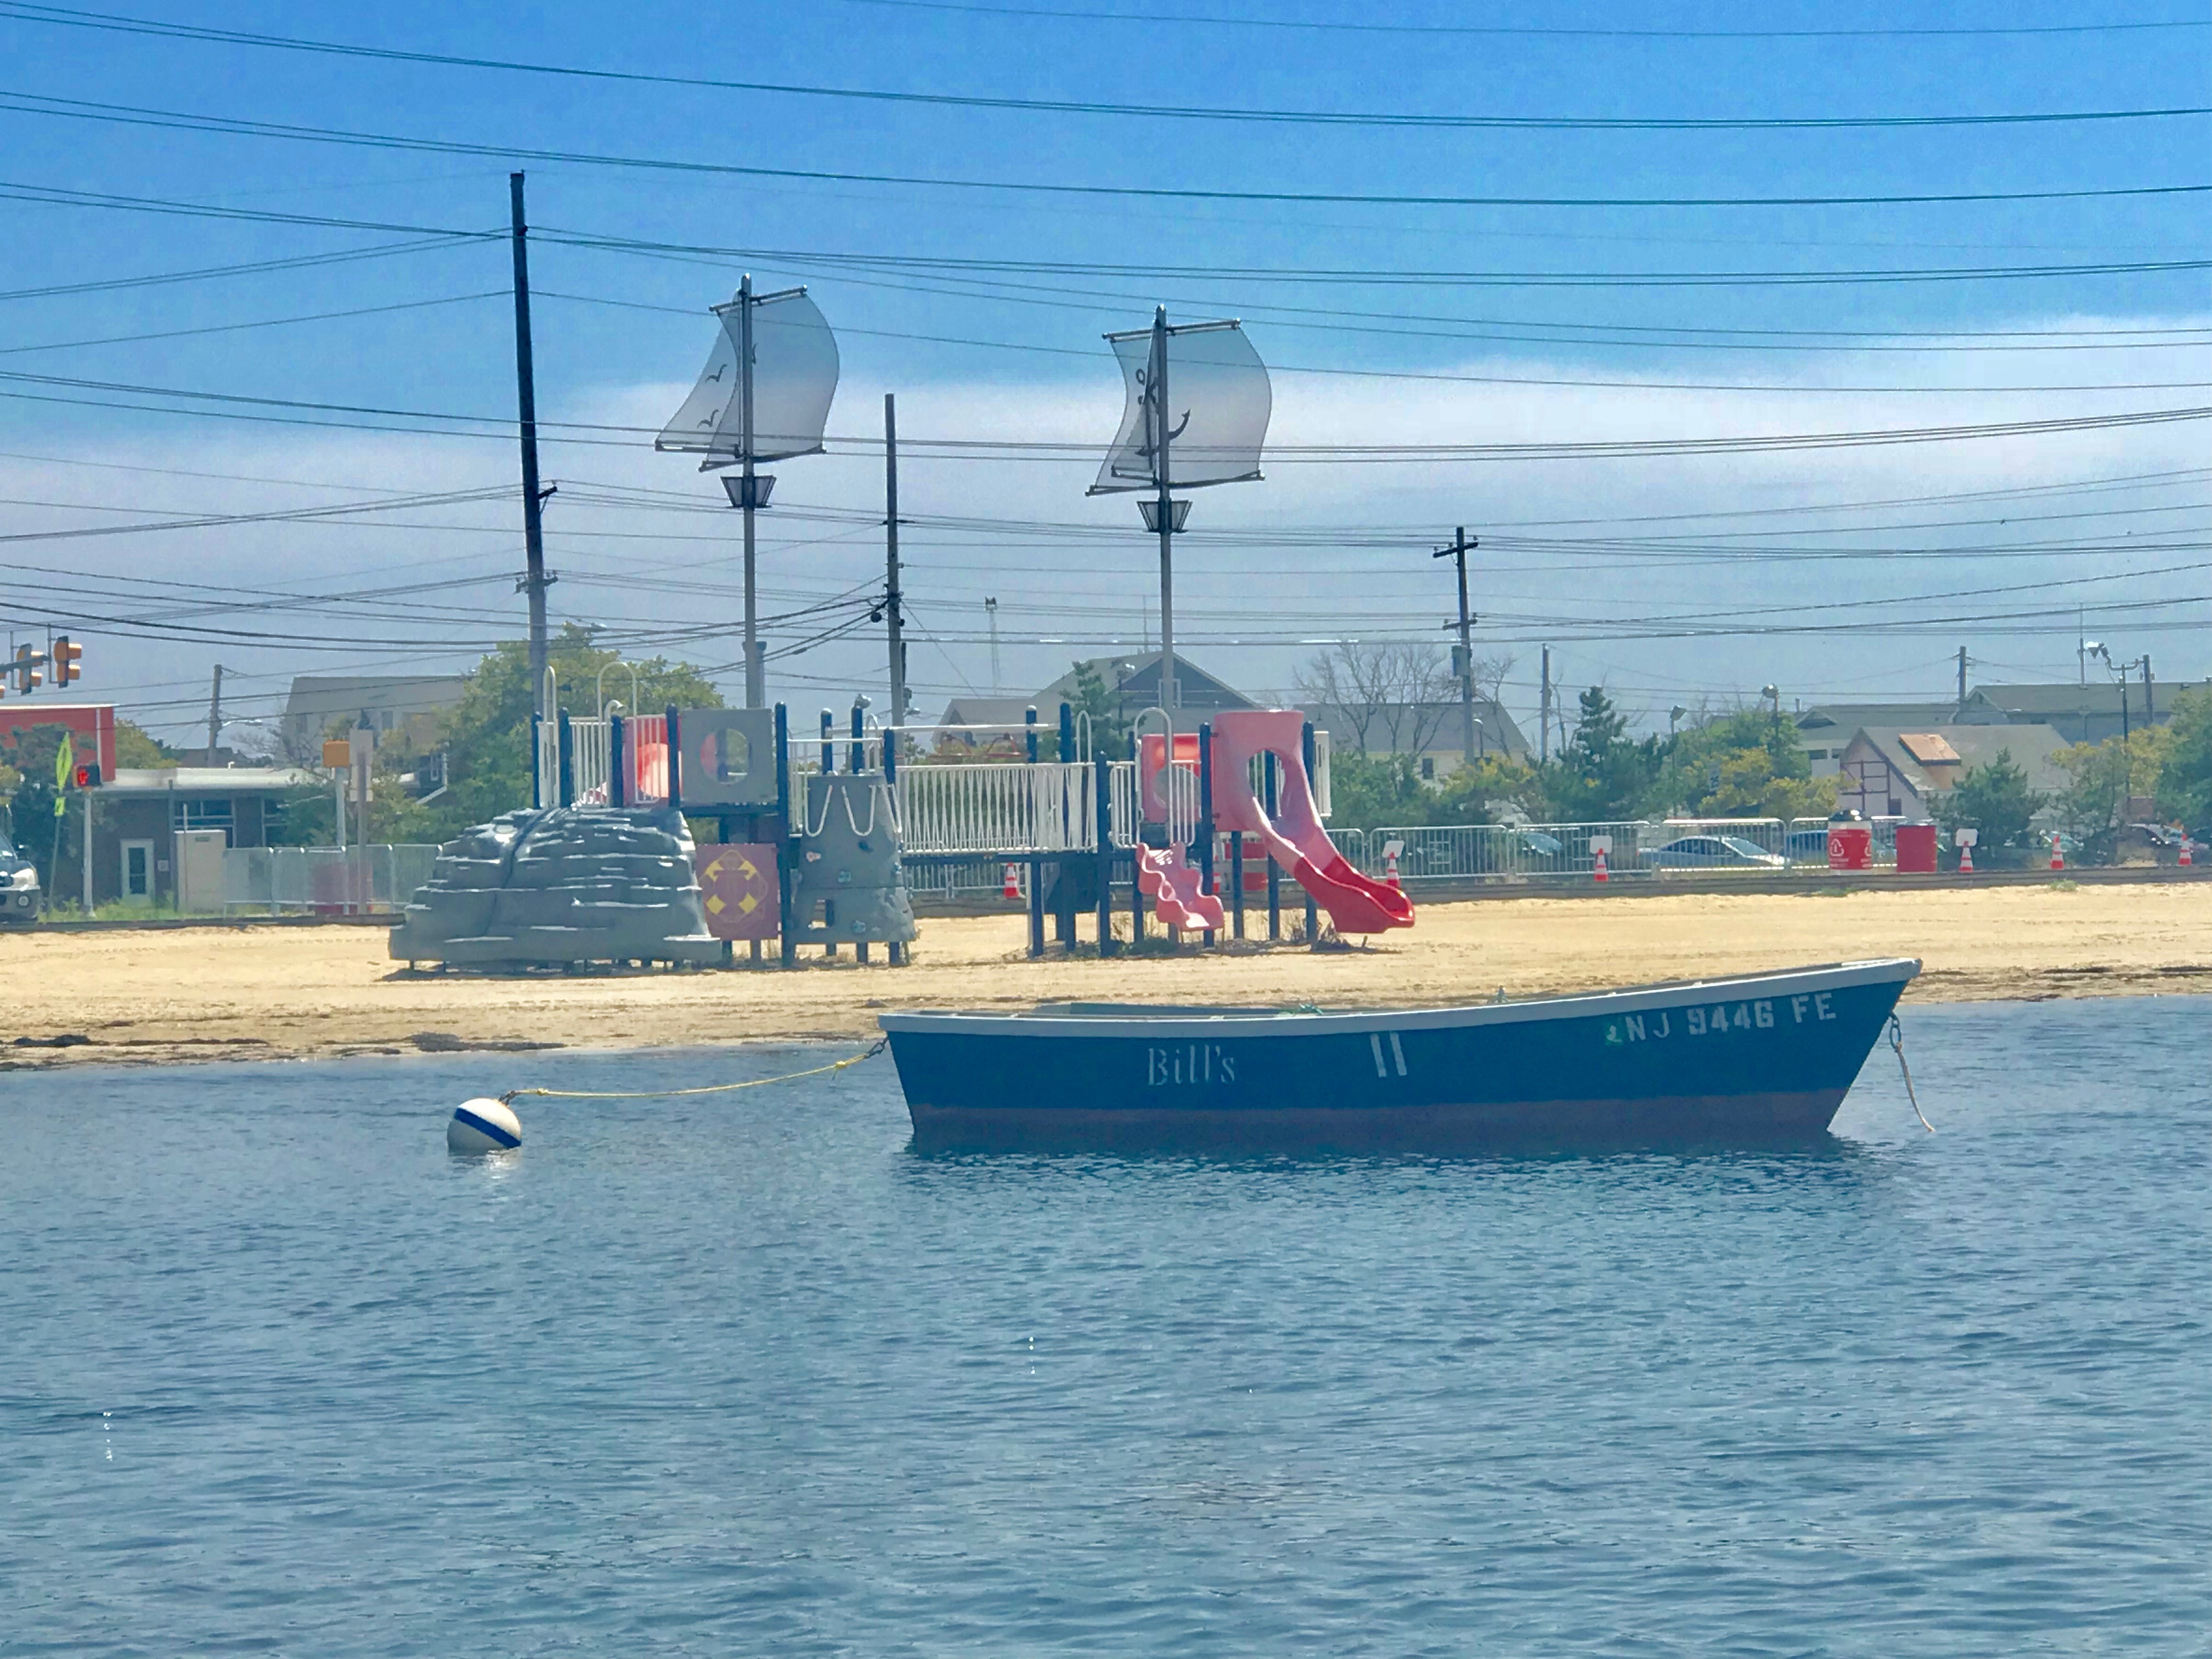 Bill's Boat Rentals, NJ boat rentals, Seaside Heights, Jersey Shore boat rentals